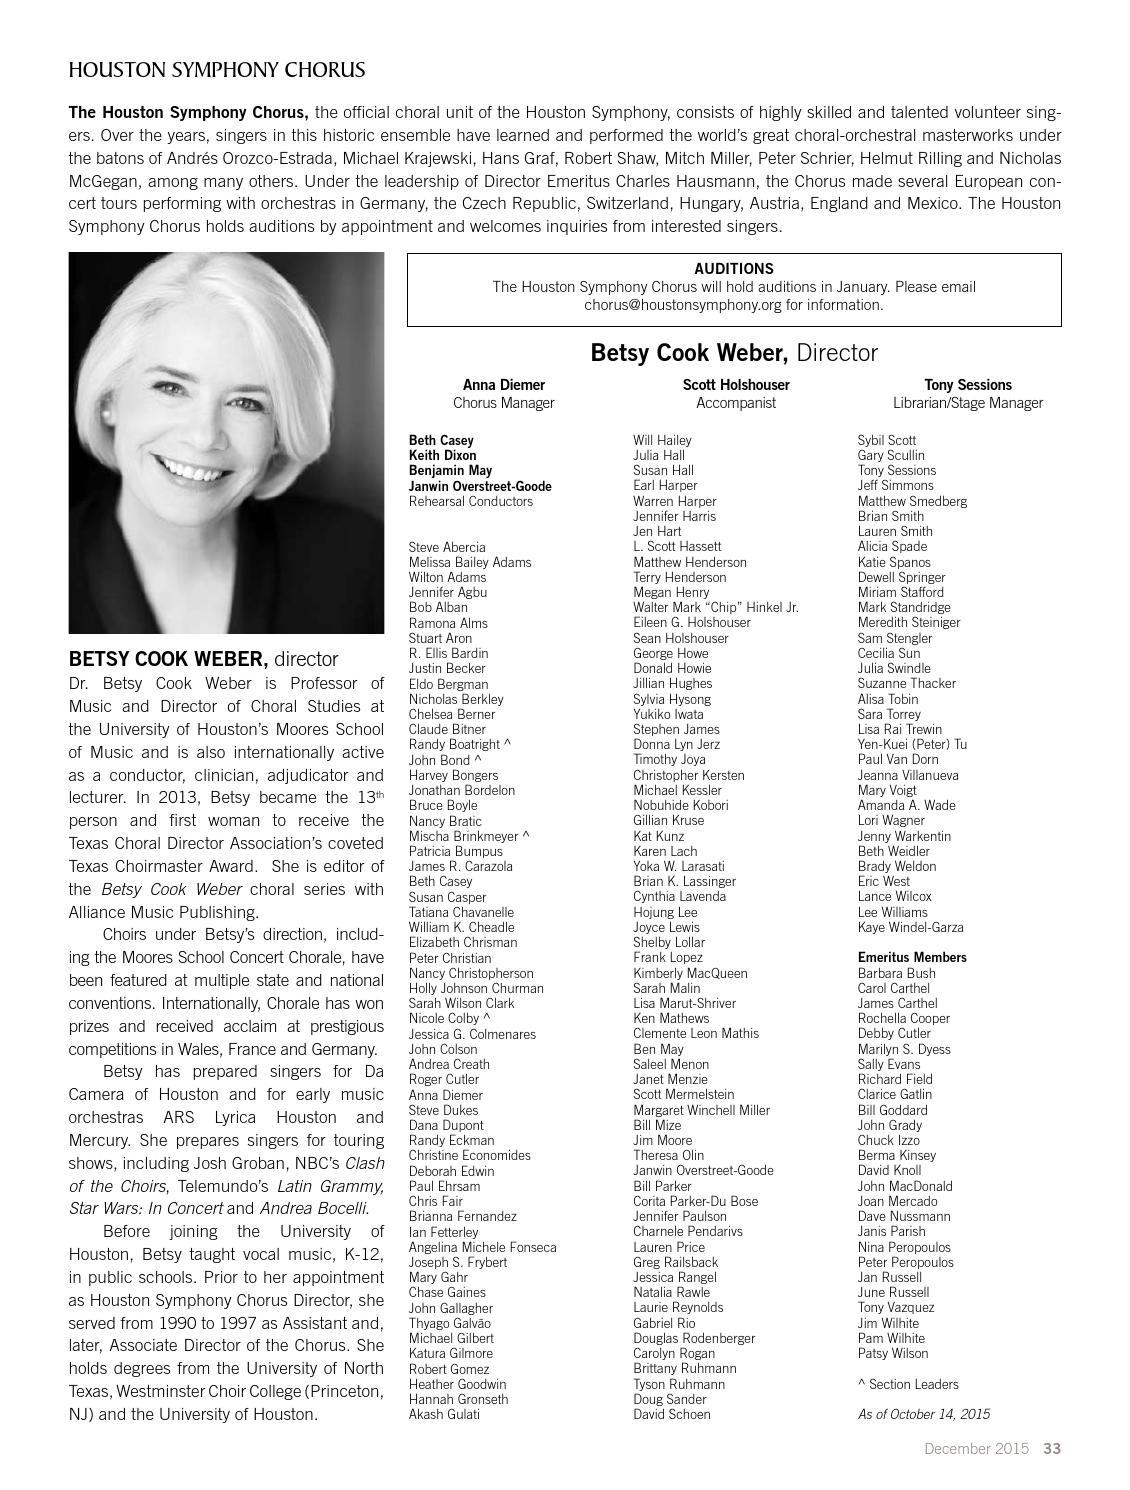 Houston Symphony Magazine — December 2015 by Houston